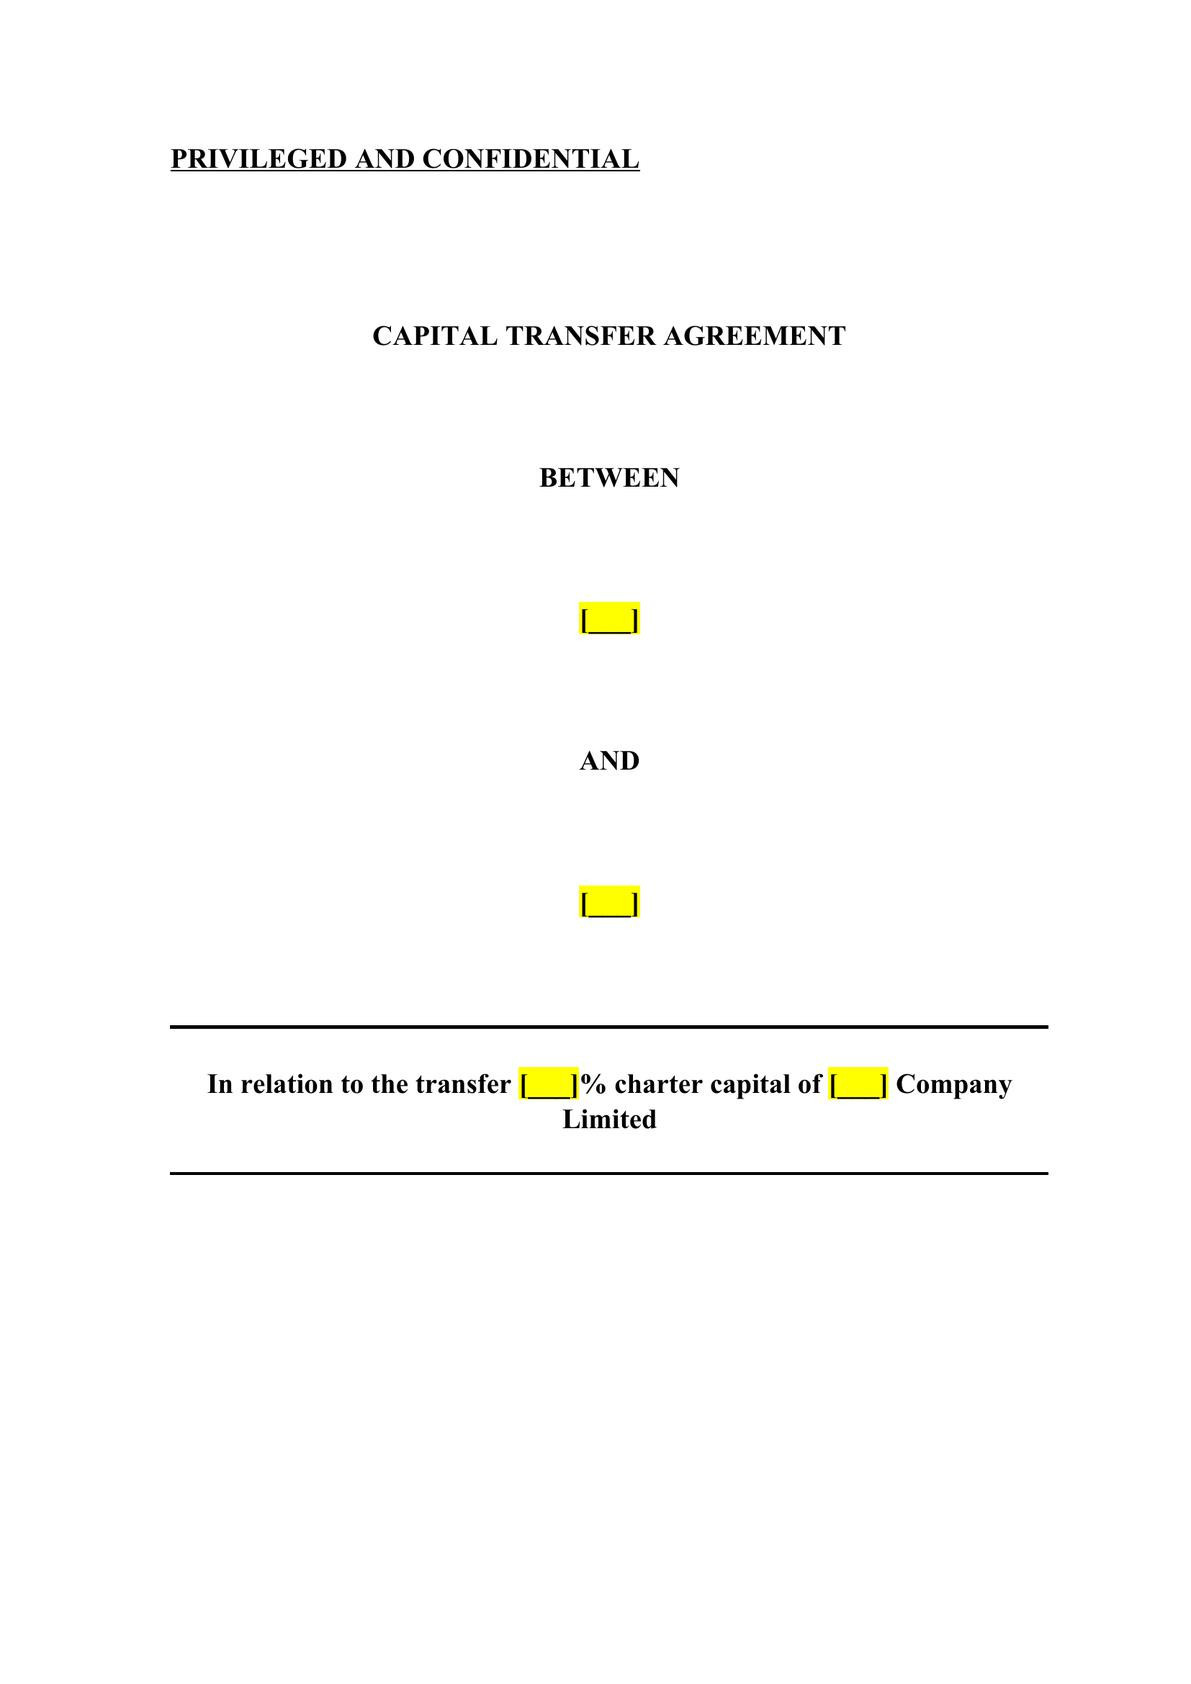 CAPITAL TRANSFER AGREEMENT -0